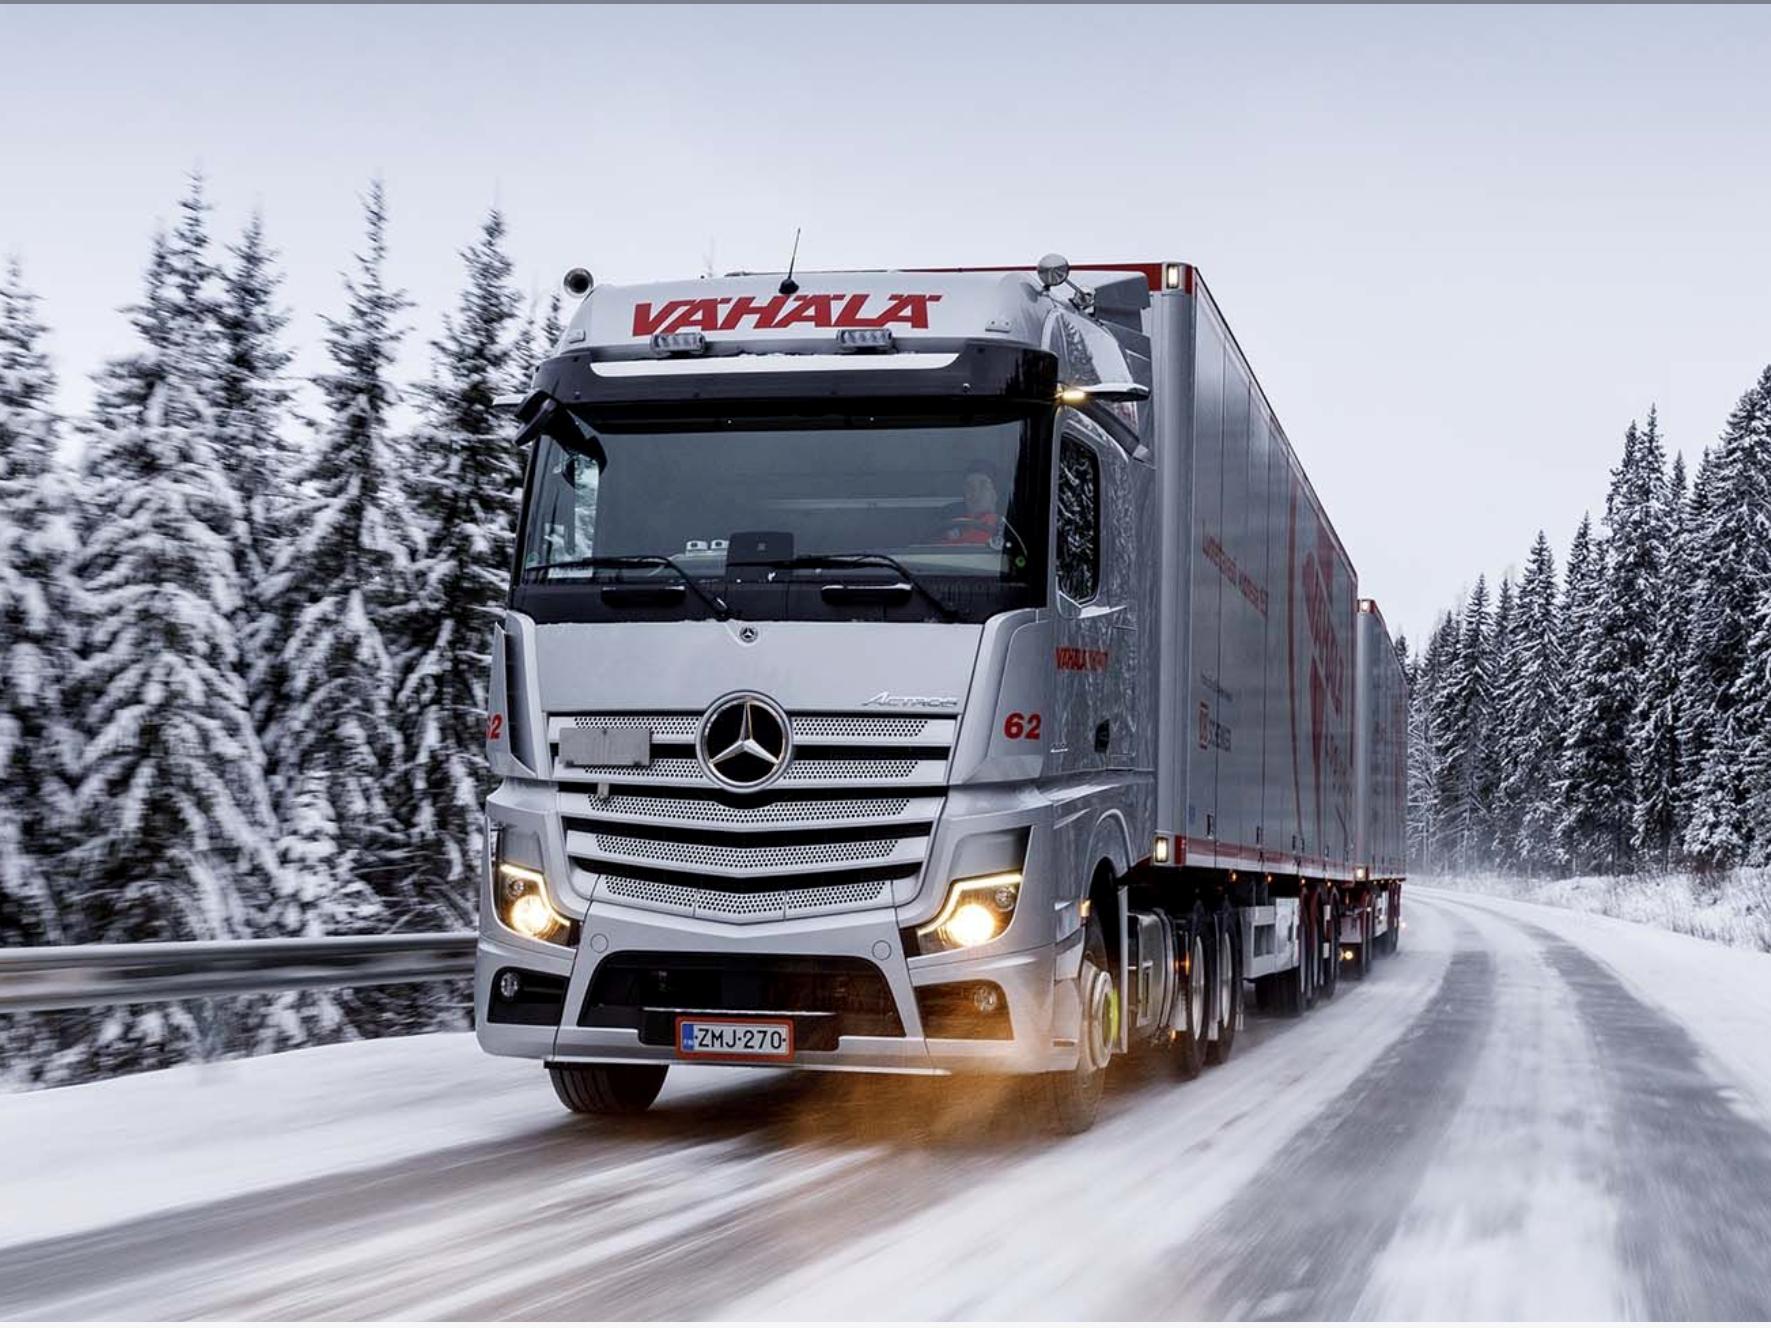 Dubbele trailer combi's in Finse praktijk (Bigtruck)